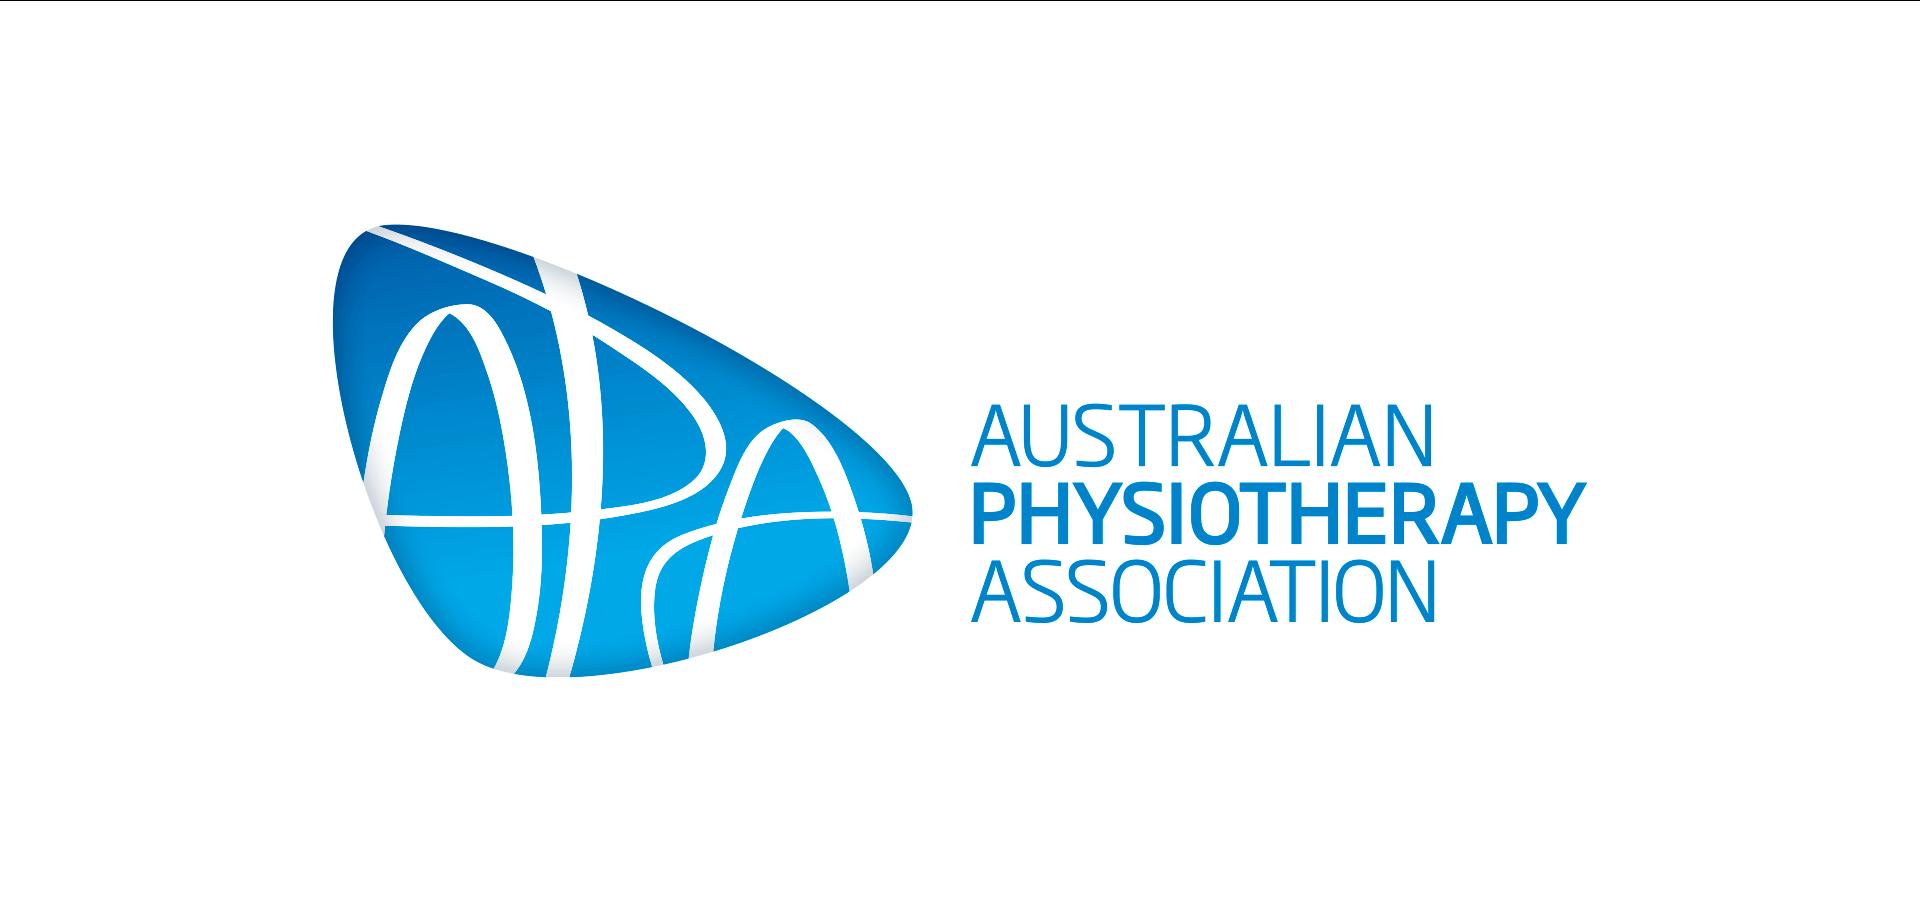 The APA logo